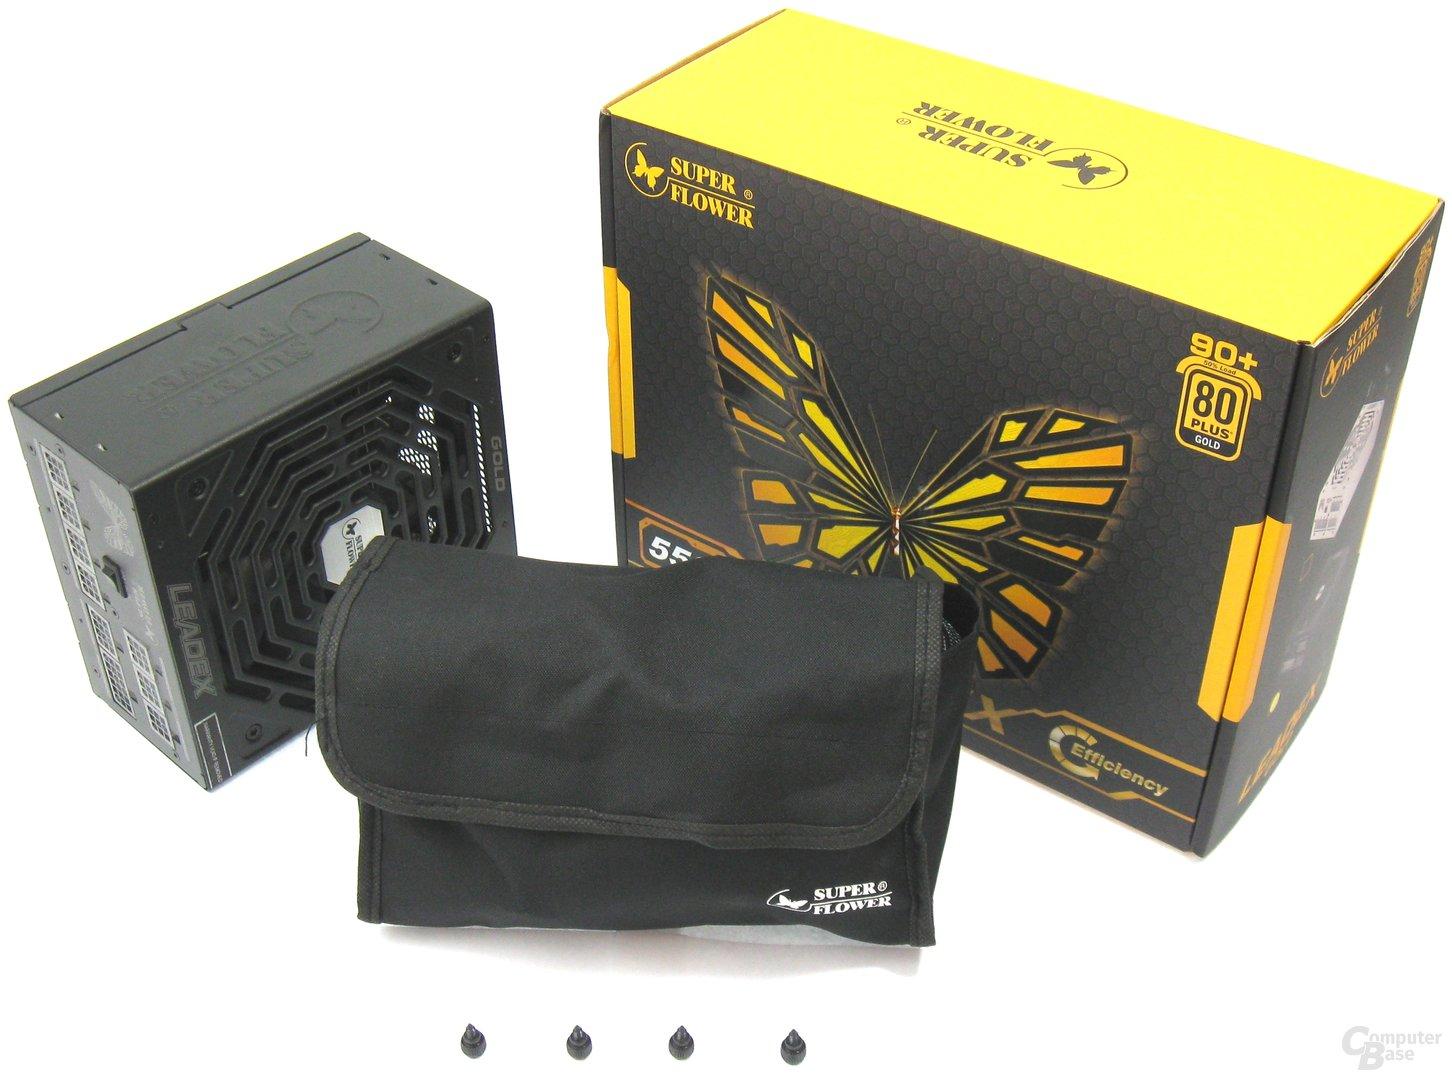 Super Flower Leadex Gold 550W